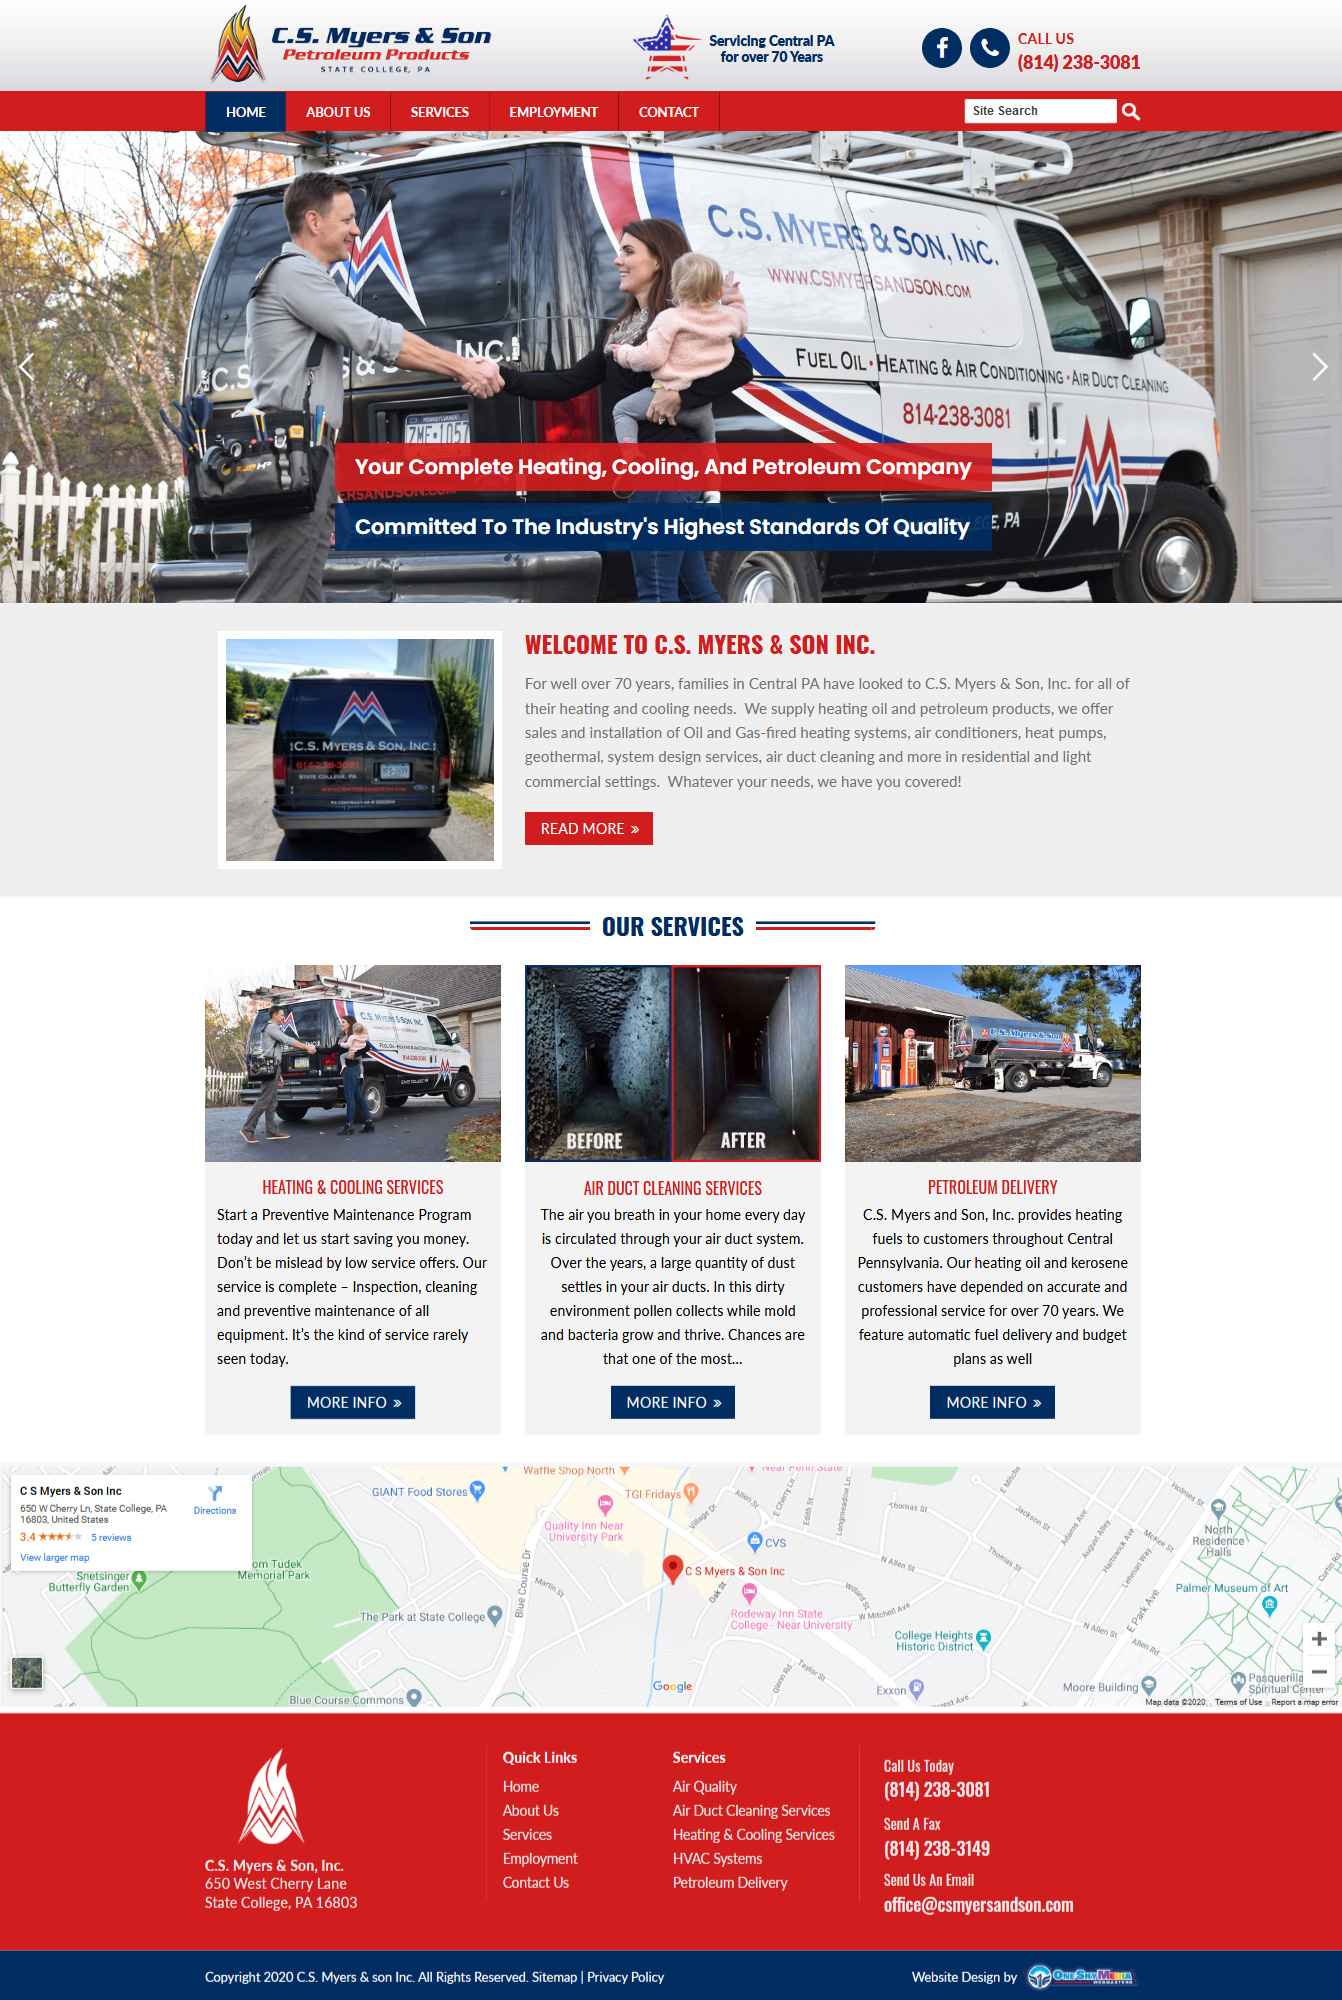 C S Myers & Sons - oil company website design